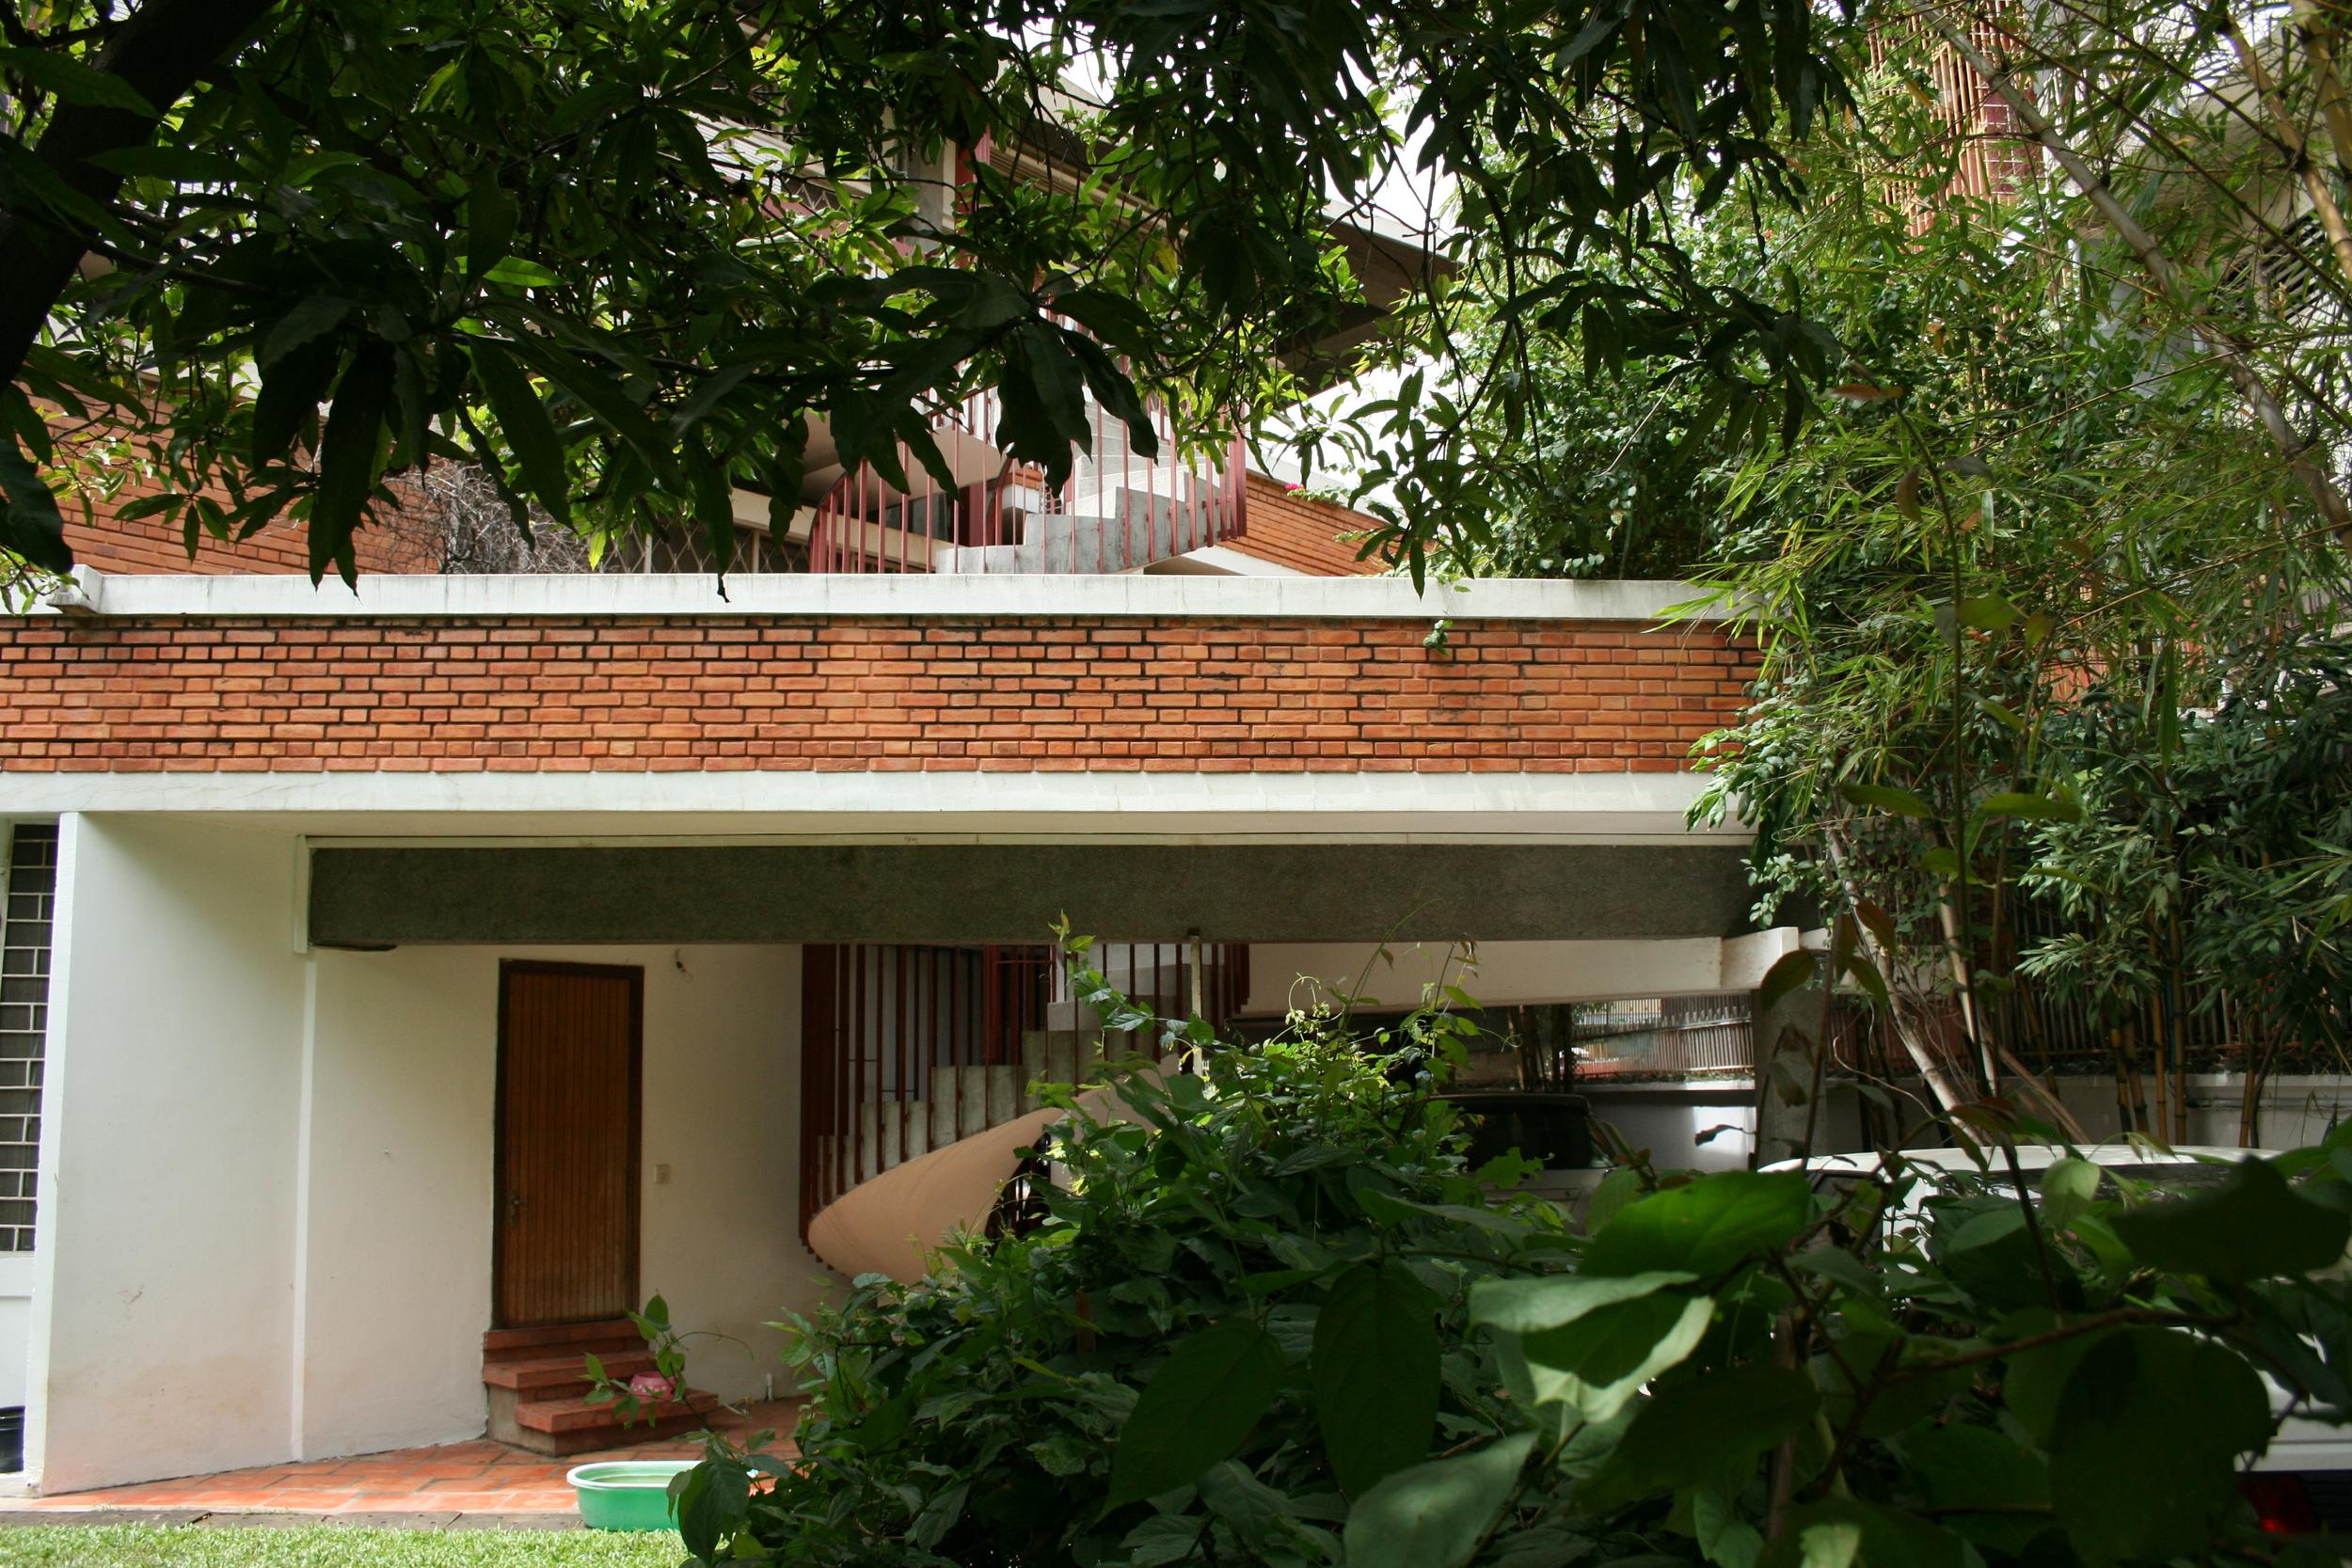 House Entrance, Courtesy of the Vann Molyvann Project